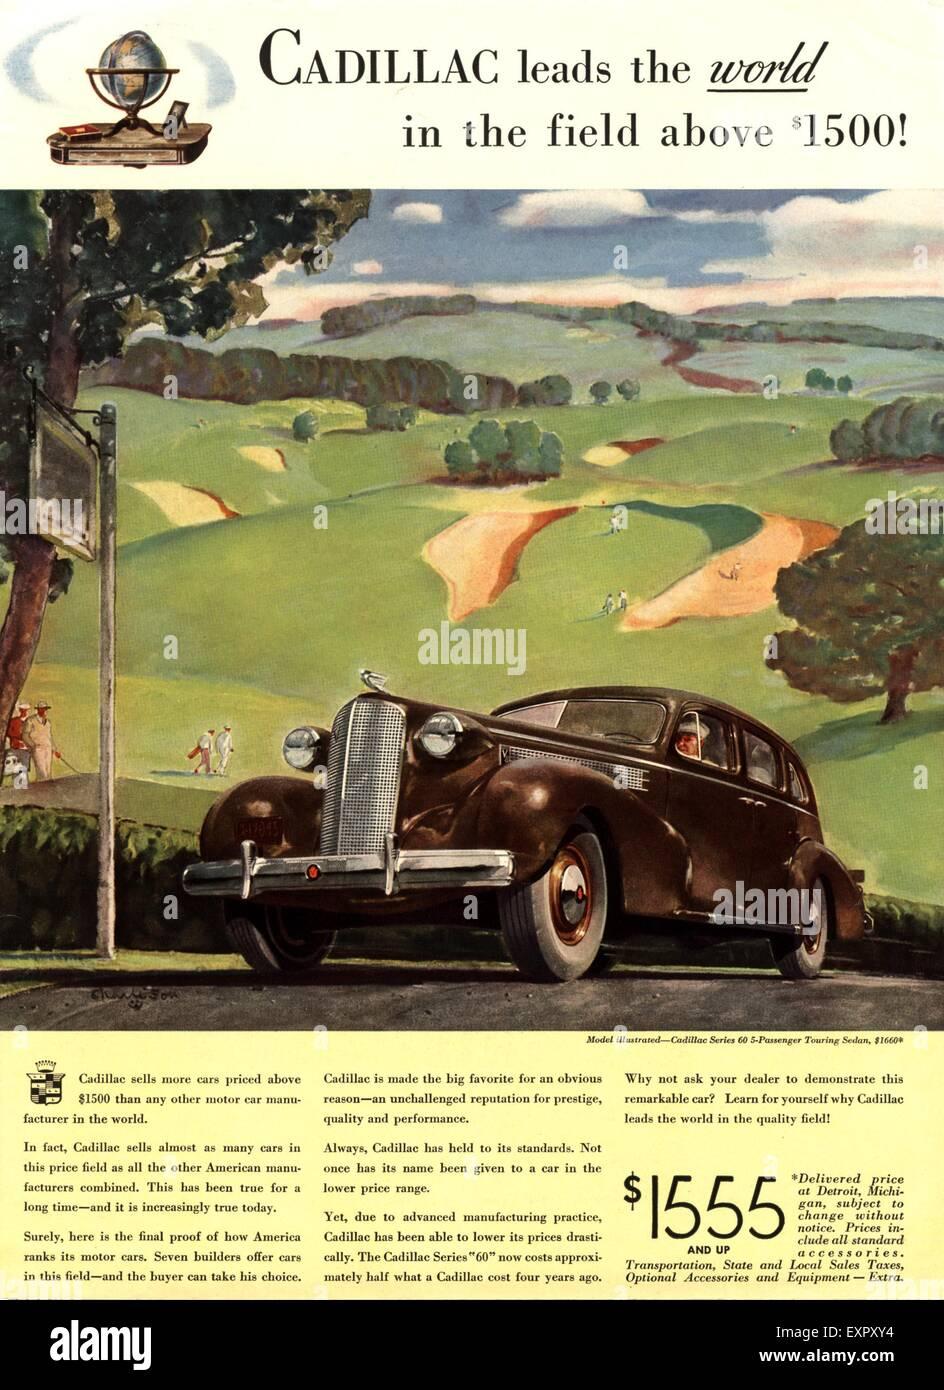 1930s Usa Cadillac Magazine Advert Stock Photo 85326616 Alamy